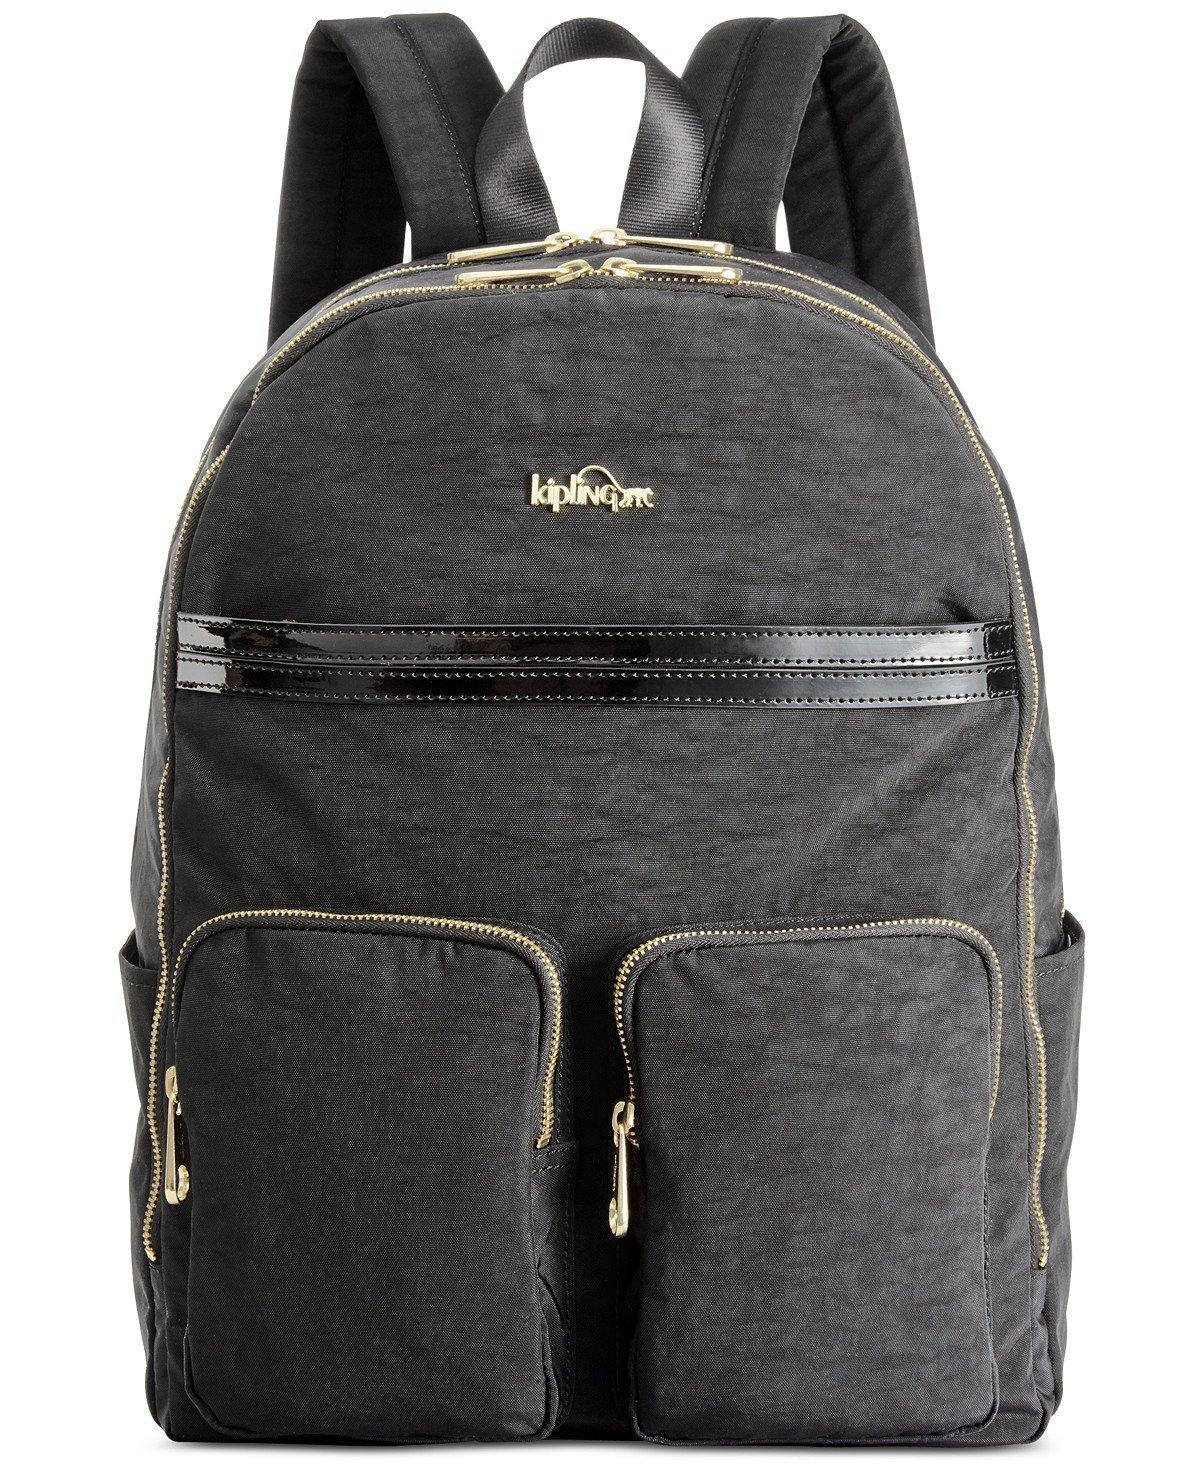 Functional Laptop Backpack